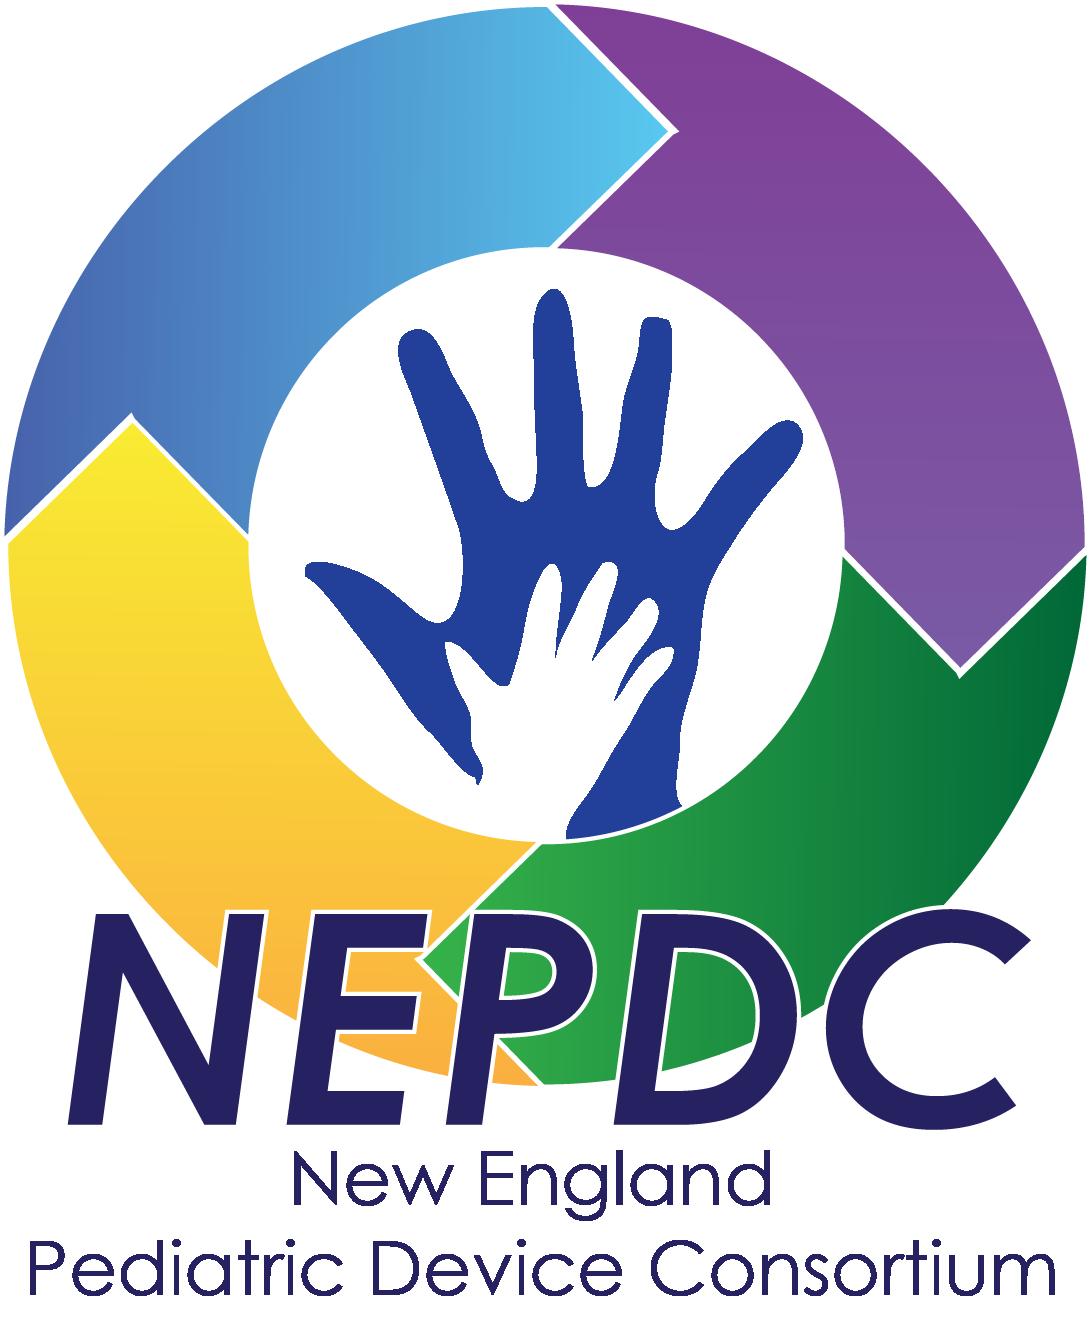 New England Pediatric Device Consortium (NEPDC)